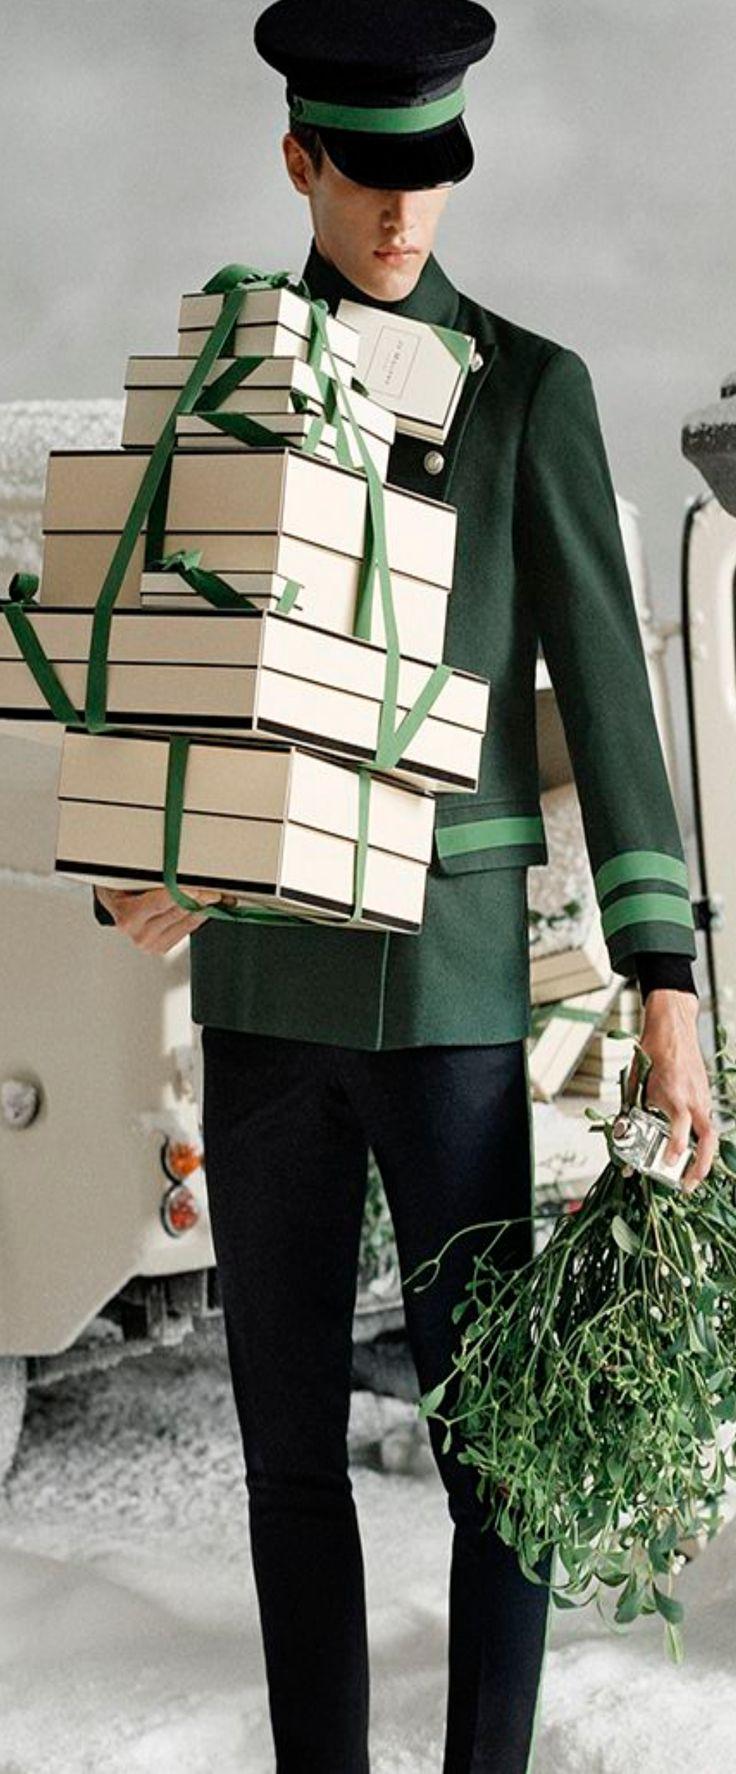 ➶ ➶ The Joy of Christmas {Noel} ➶ ➶                                                                                                                                                     More